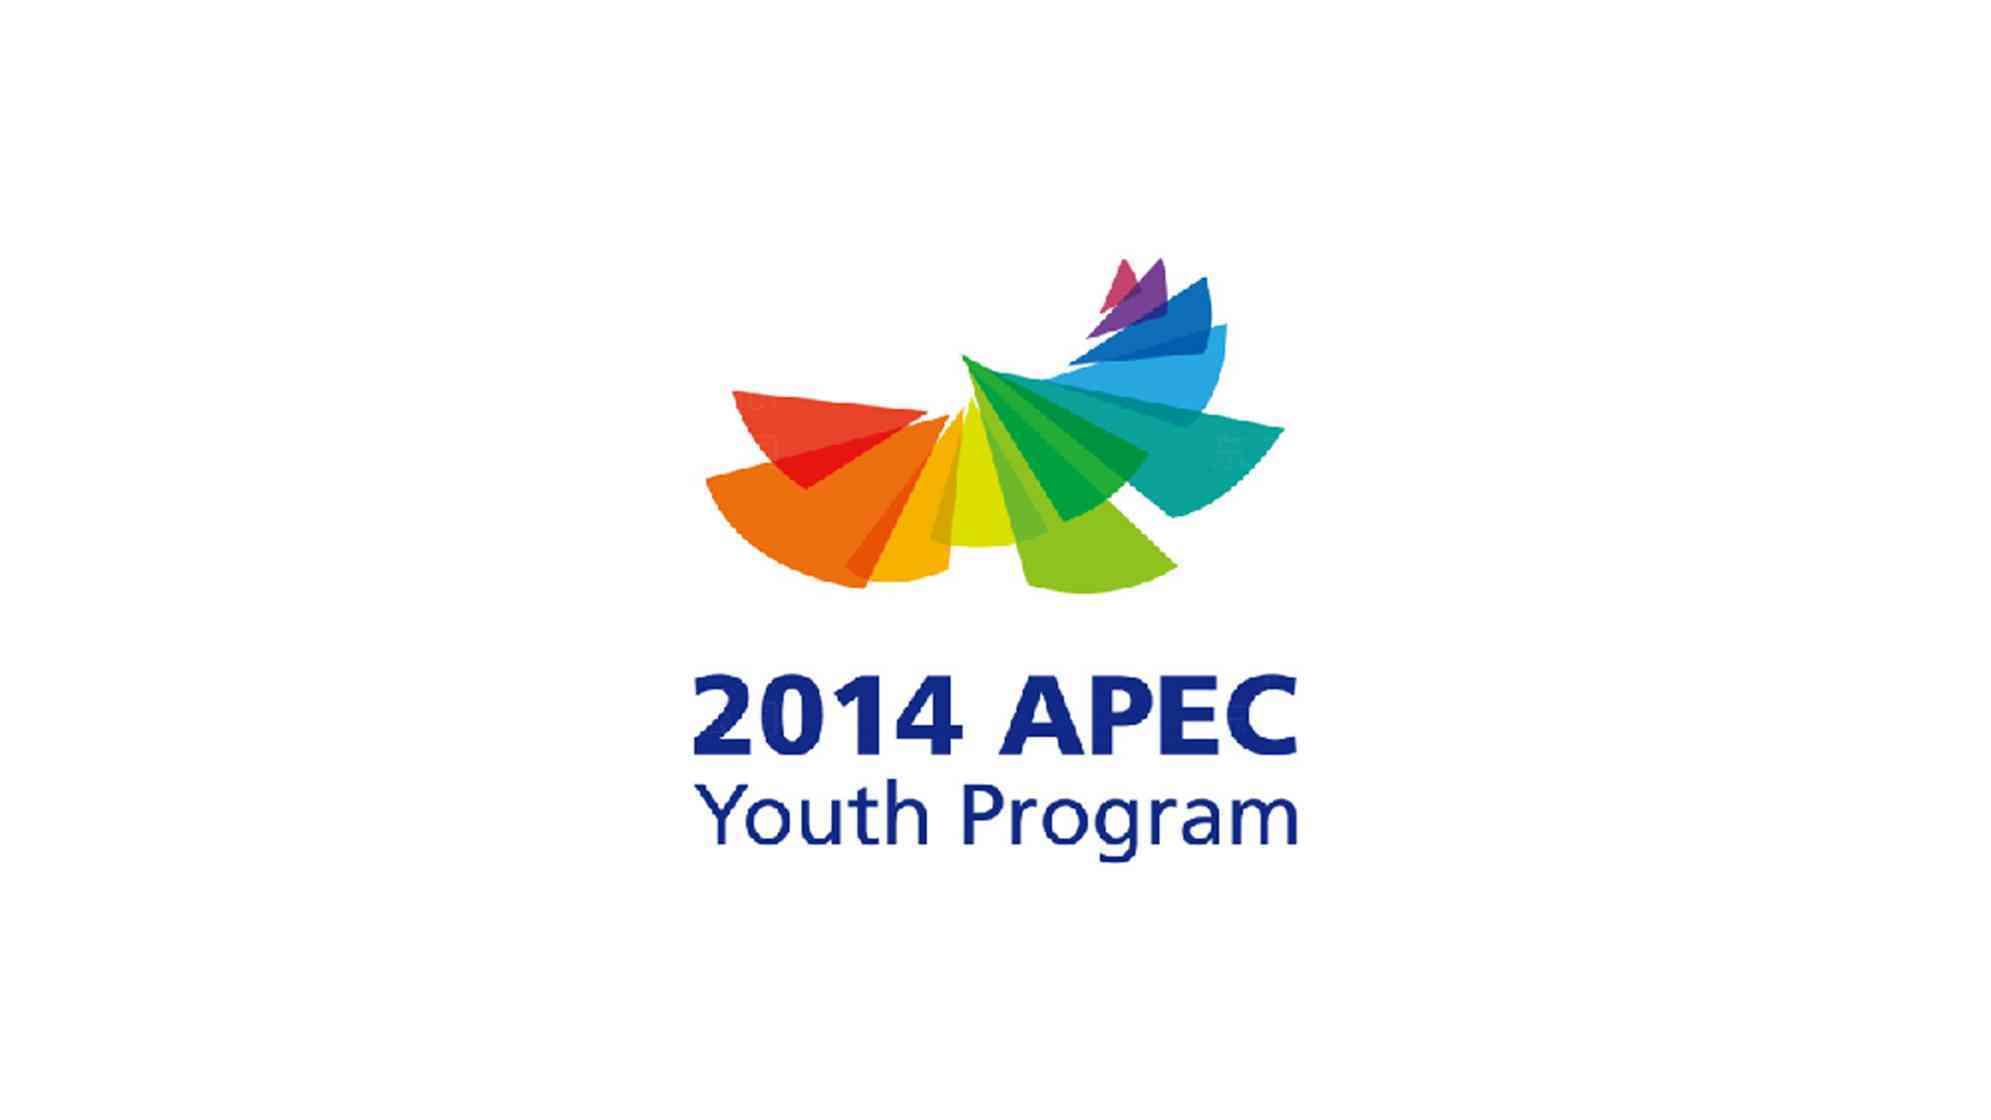 青年APEC会议LOGO设计、VI设计